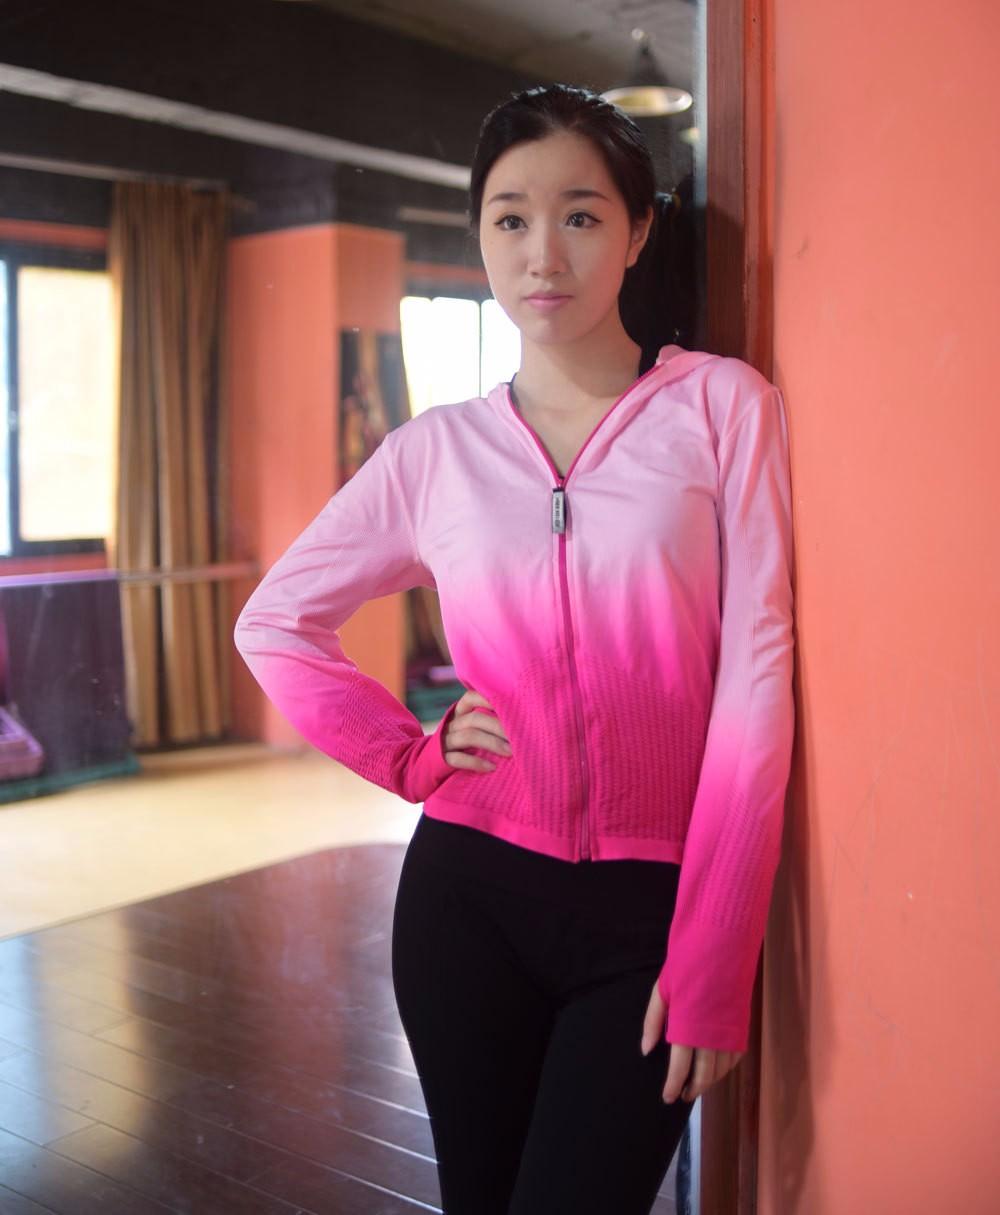 2016 Women Sports Running Hoodies Gradual Change Color Zipper Jacket With Hooded Fitness Tracksuits Long Sleeve Sweatshirts Coat